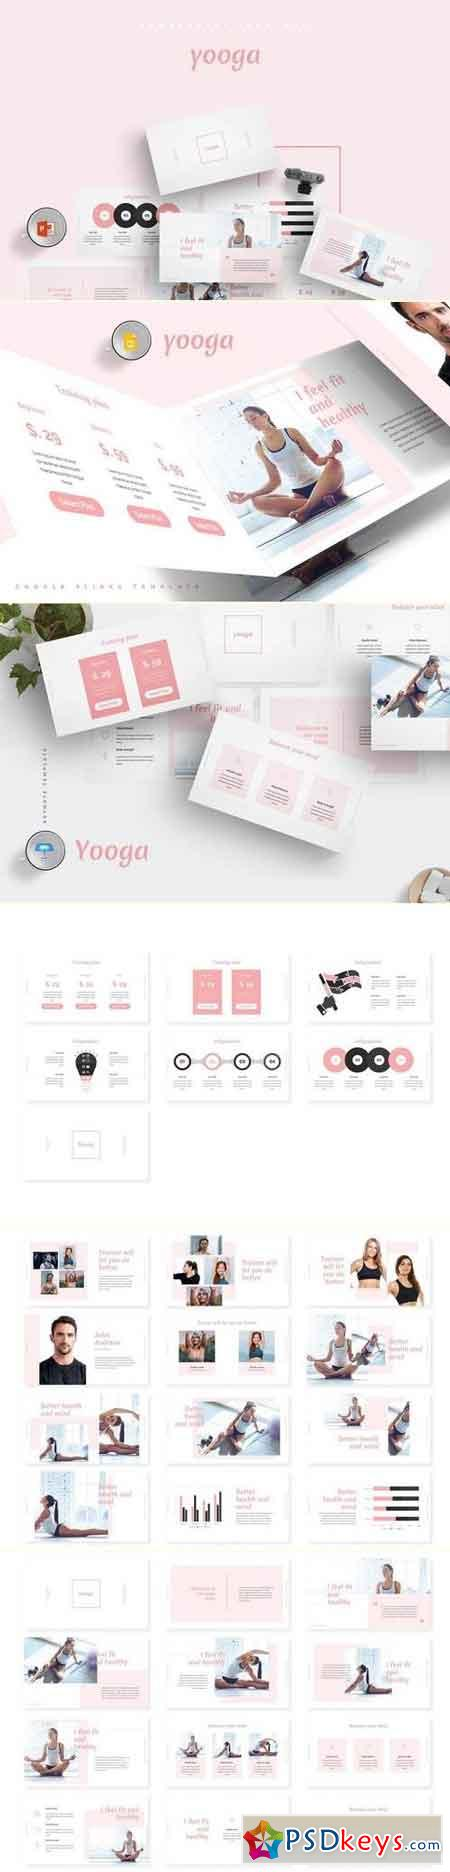 Yooga Powerpoint & Keynote & Google Slide Templates